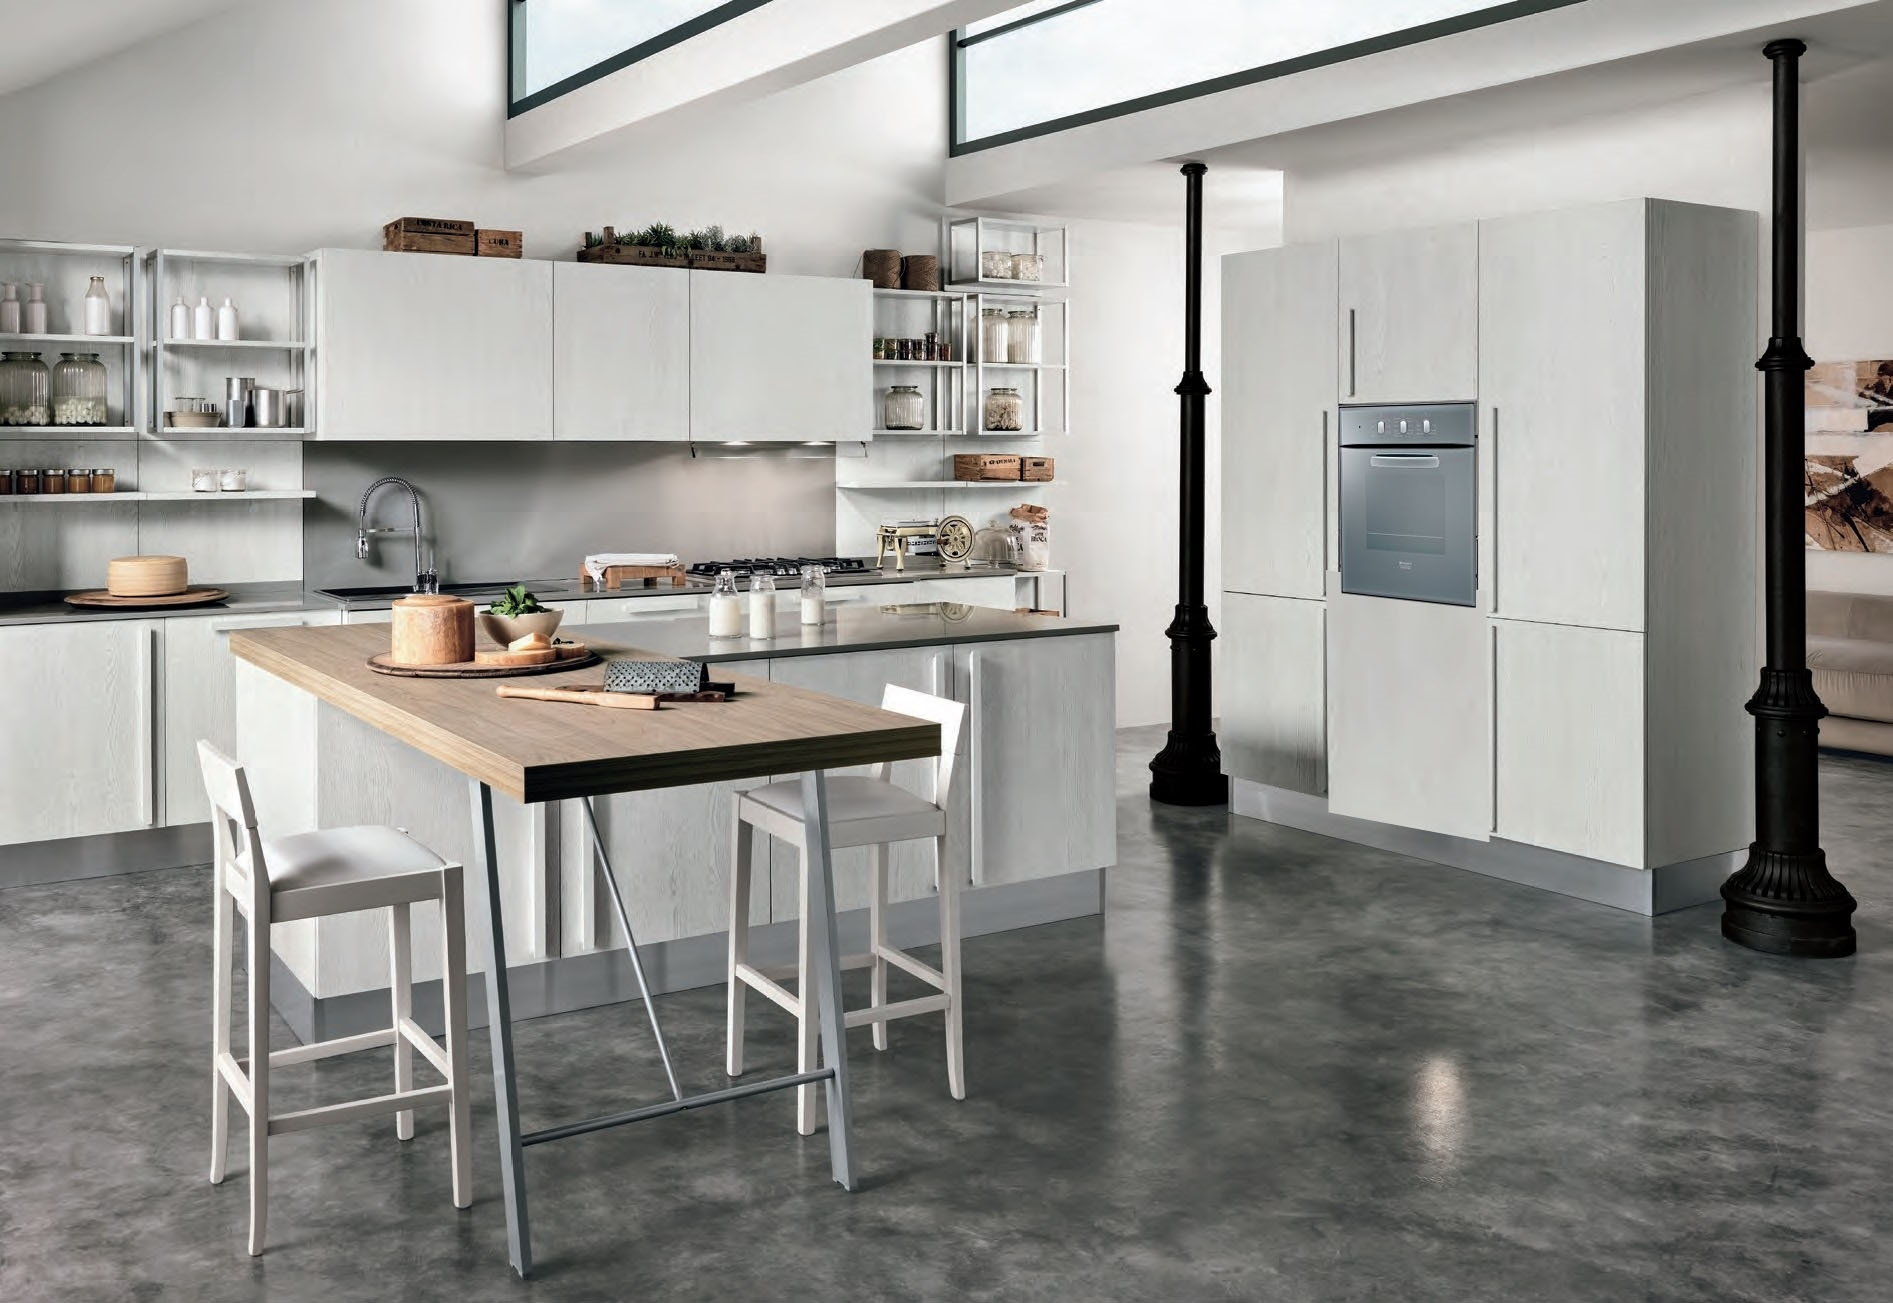 Cucina come foto in offerta con isola outlet nuovimondi for Isola cucina moderna